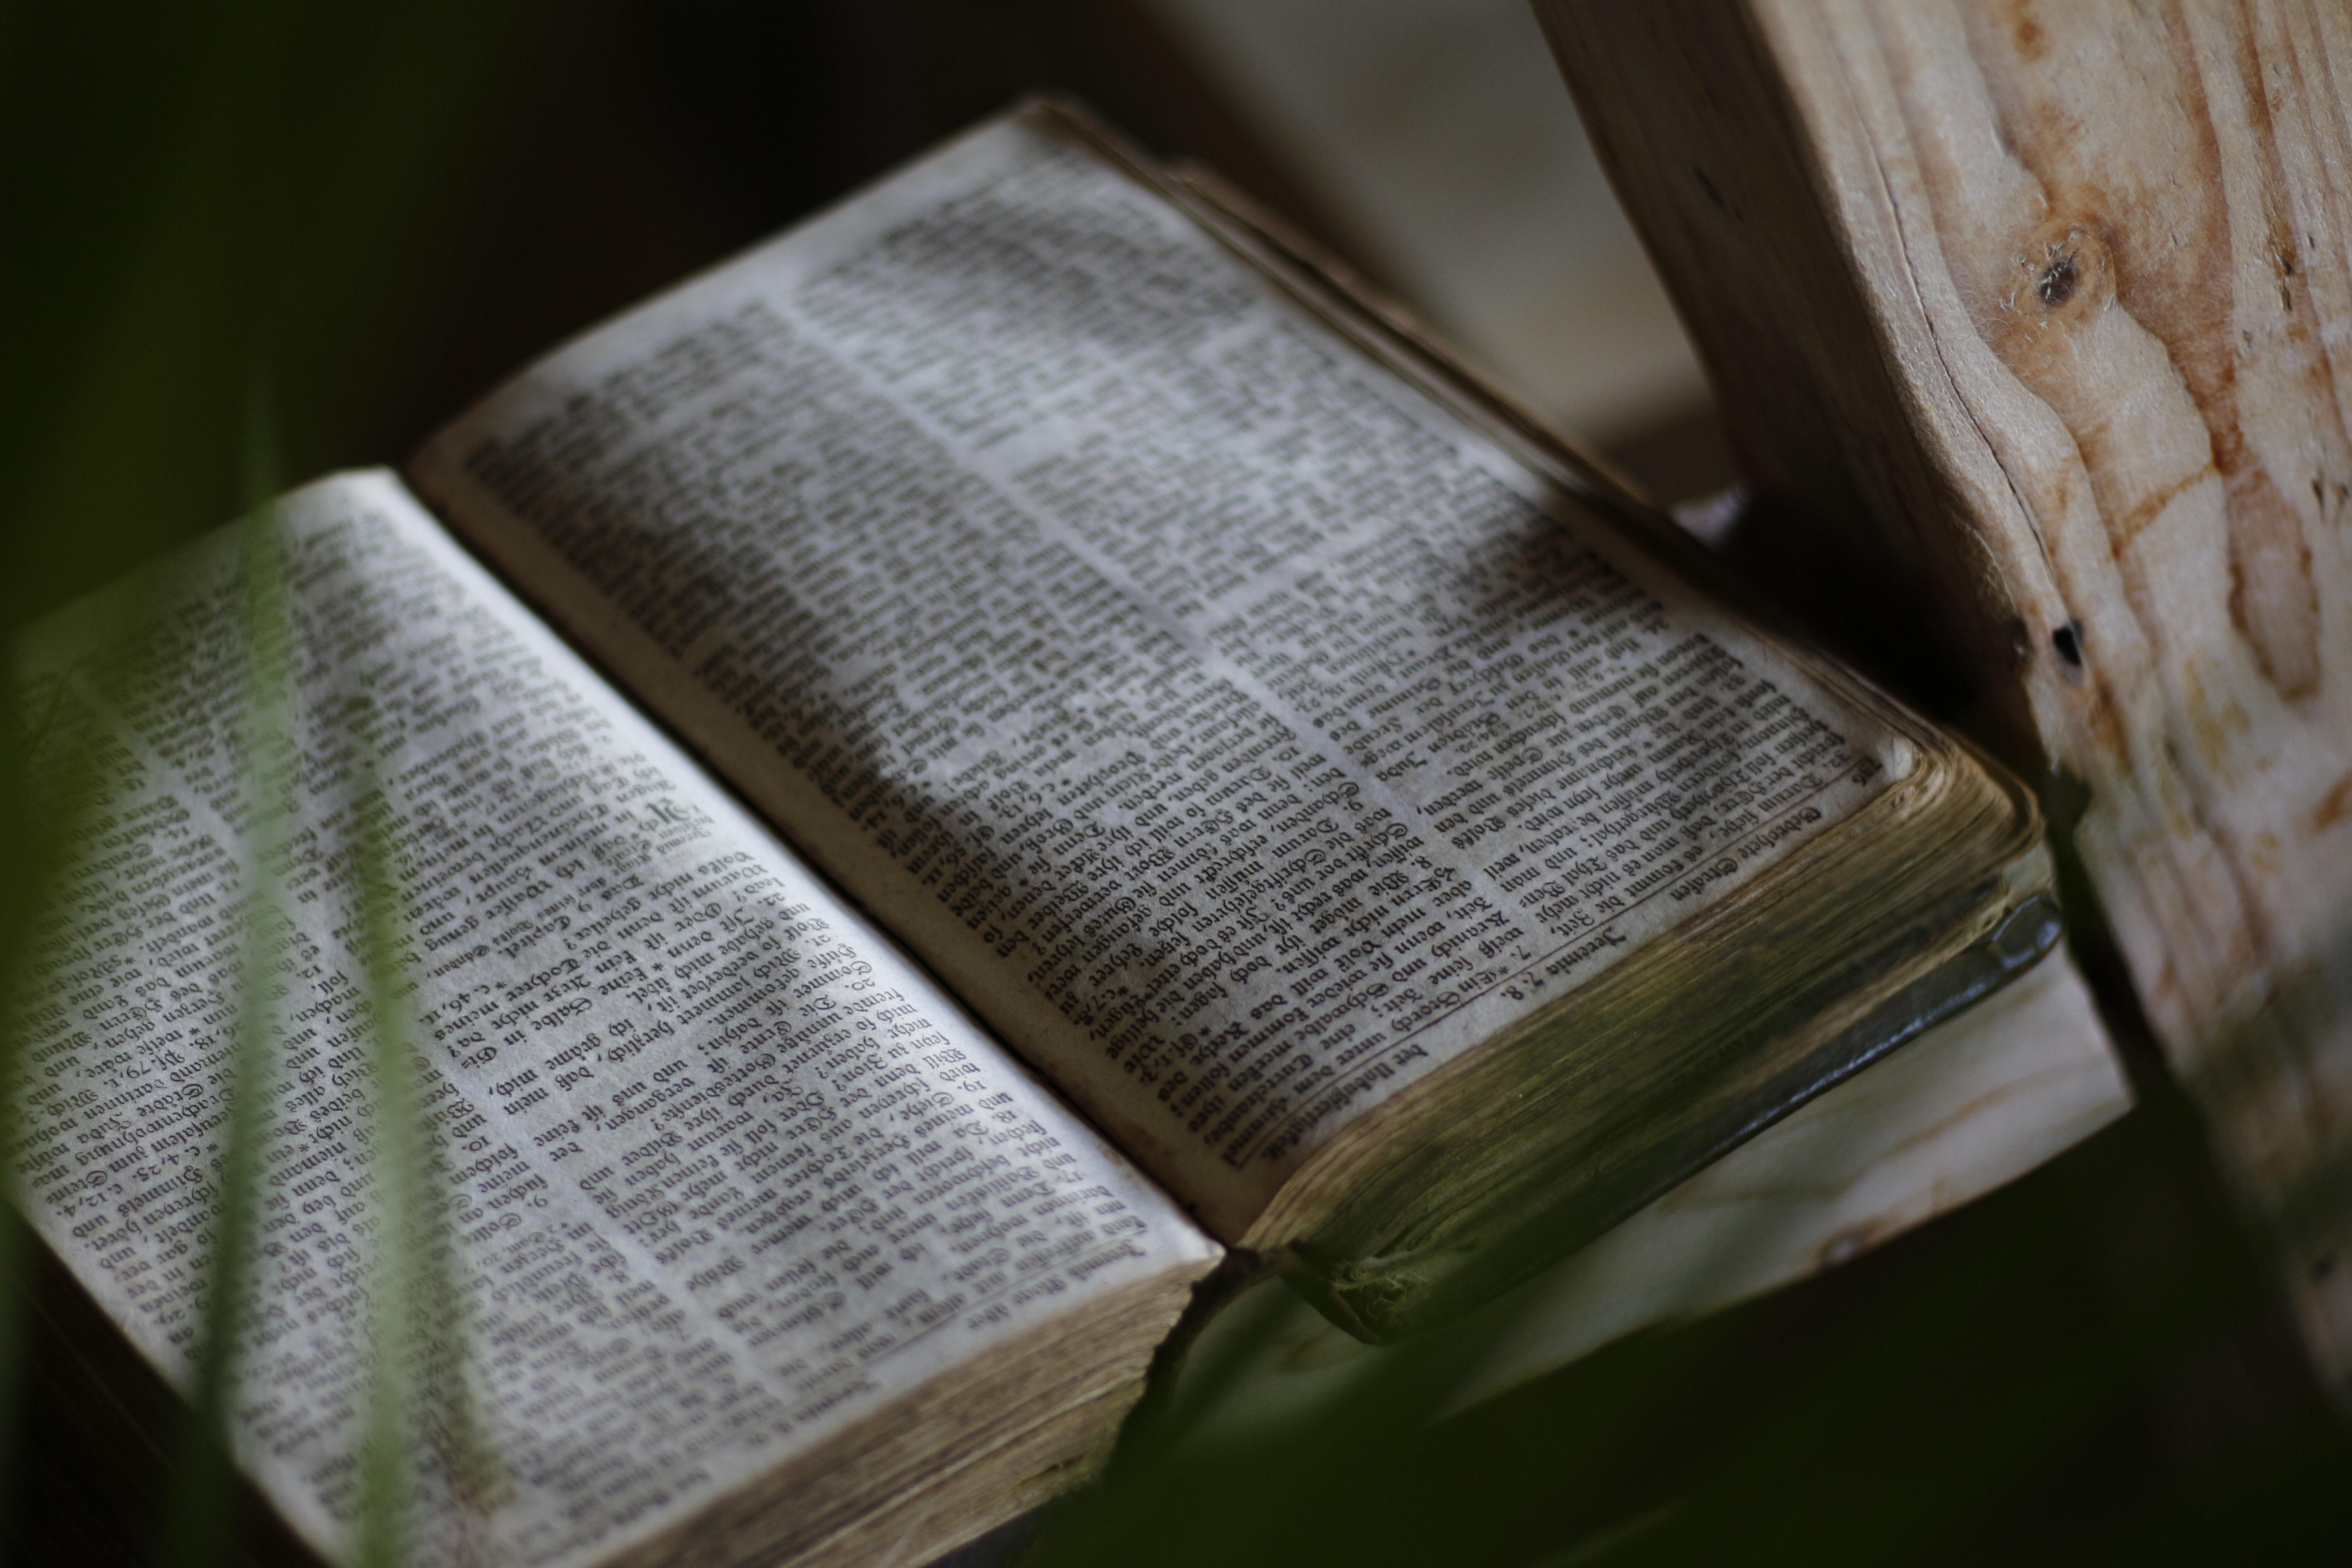 картинка древней библии шутим, нас